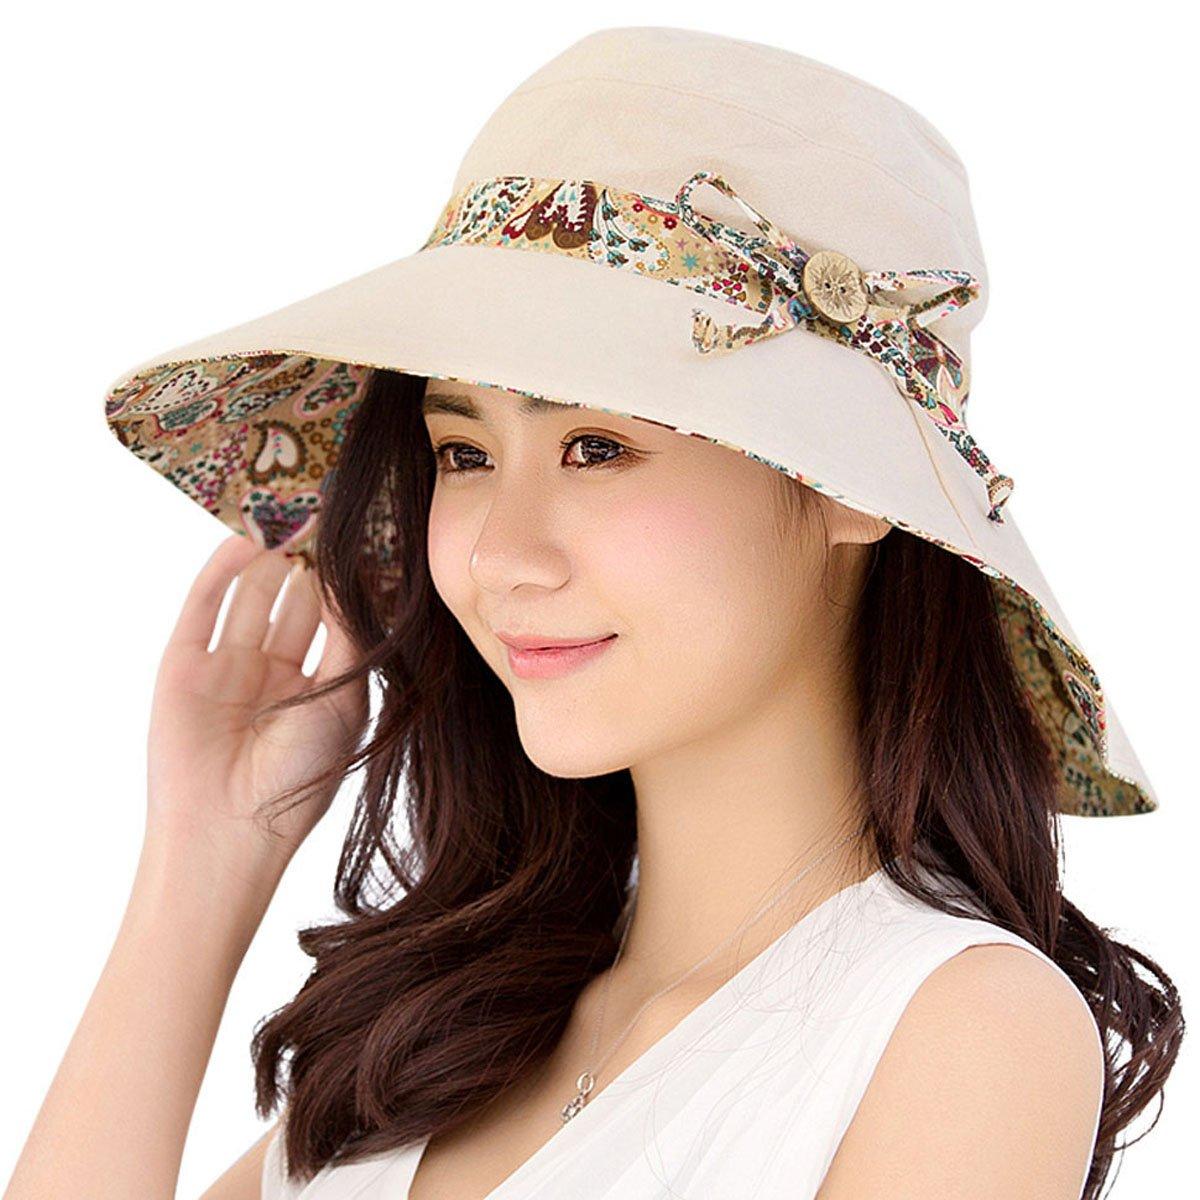 HINDAWI Womens Sun Hat Summer Reversible UPF 50+ Beach Hat Foldable Wide  Brim Cap 2ffbd70abdf